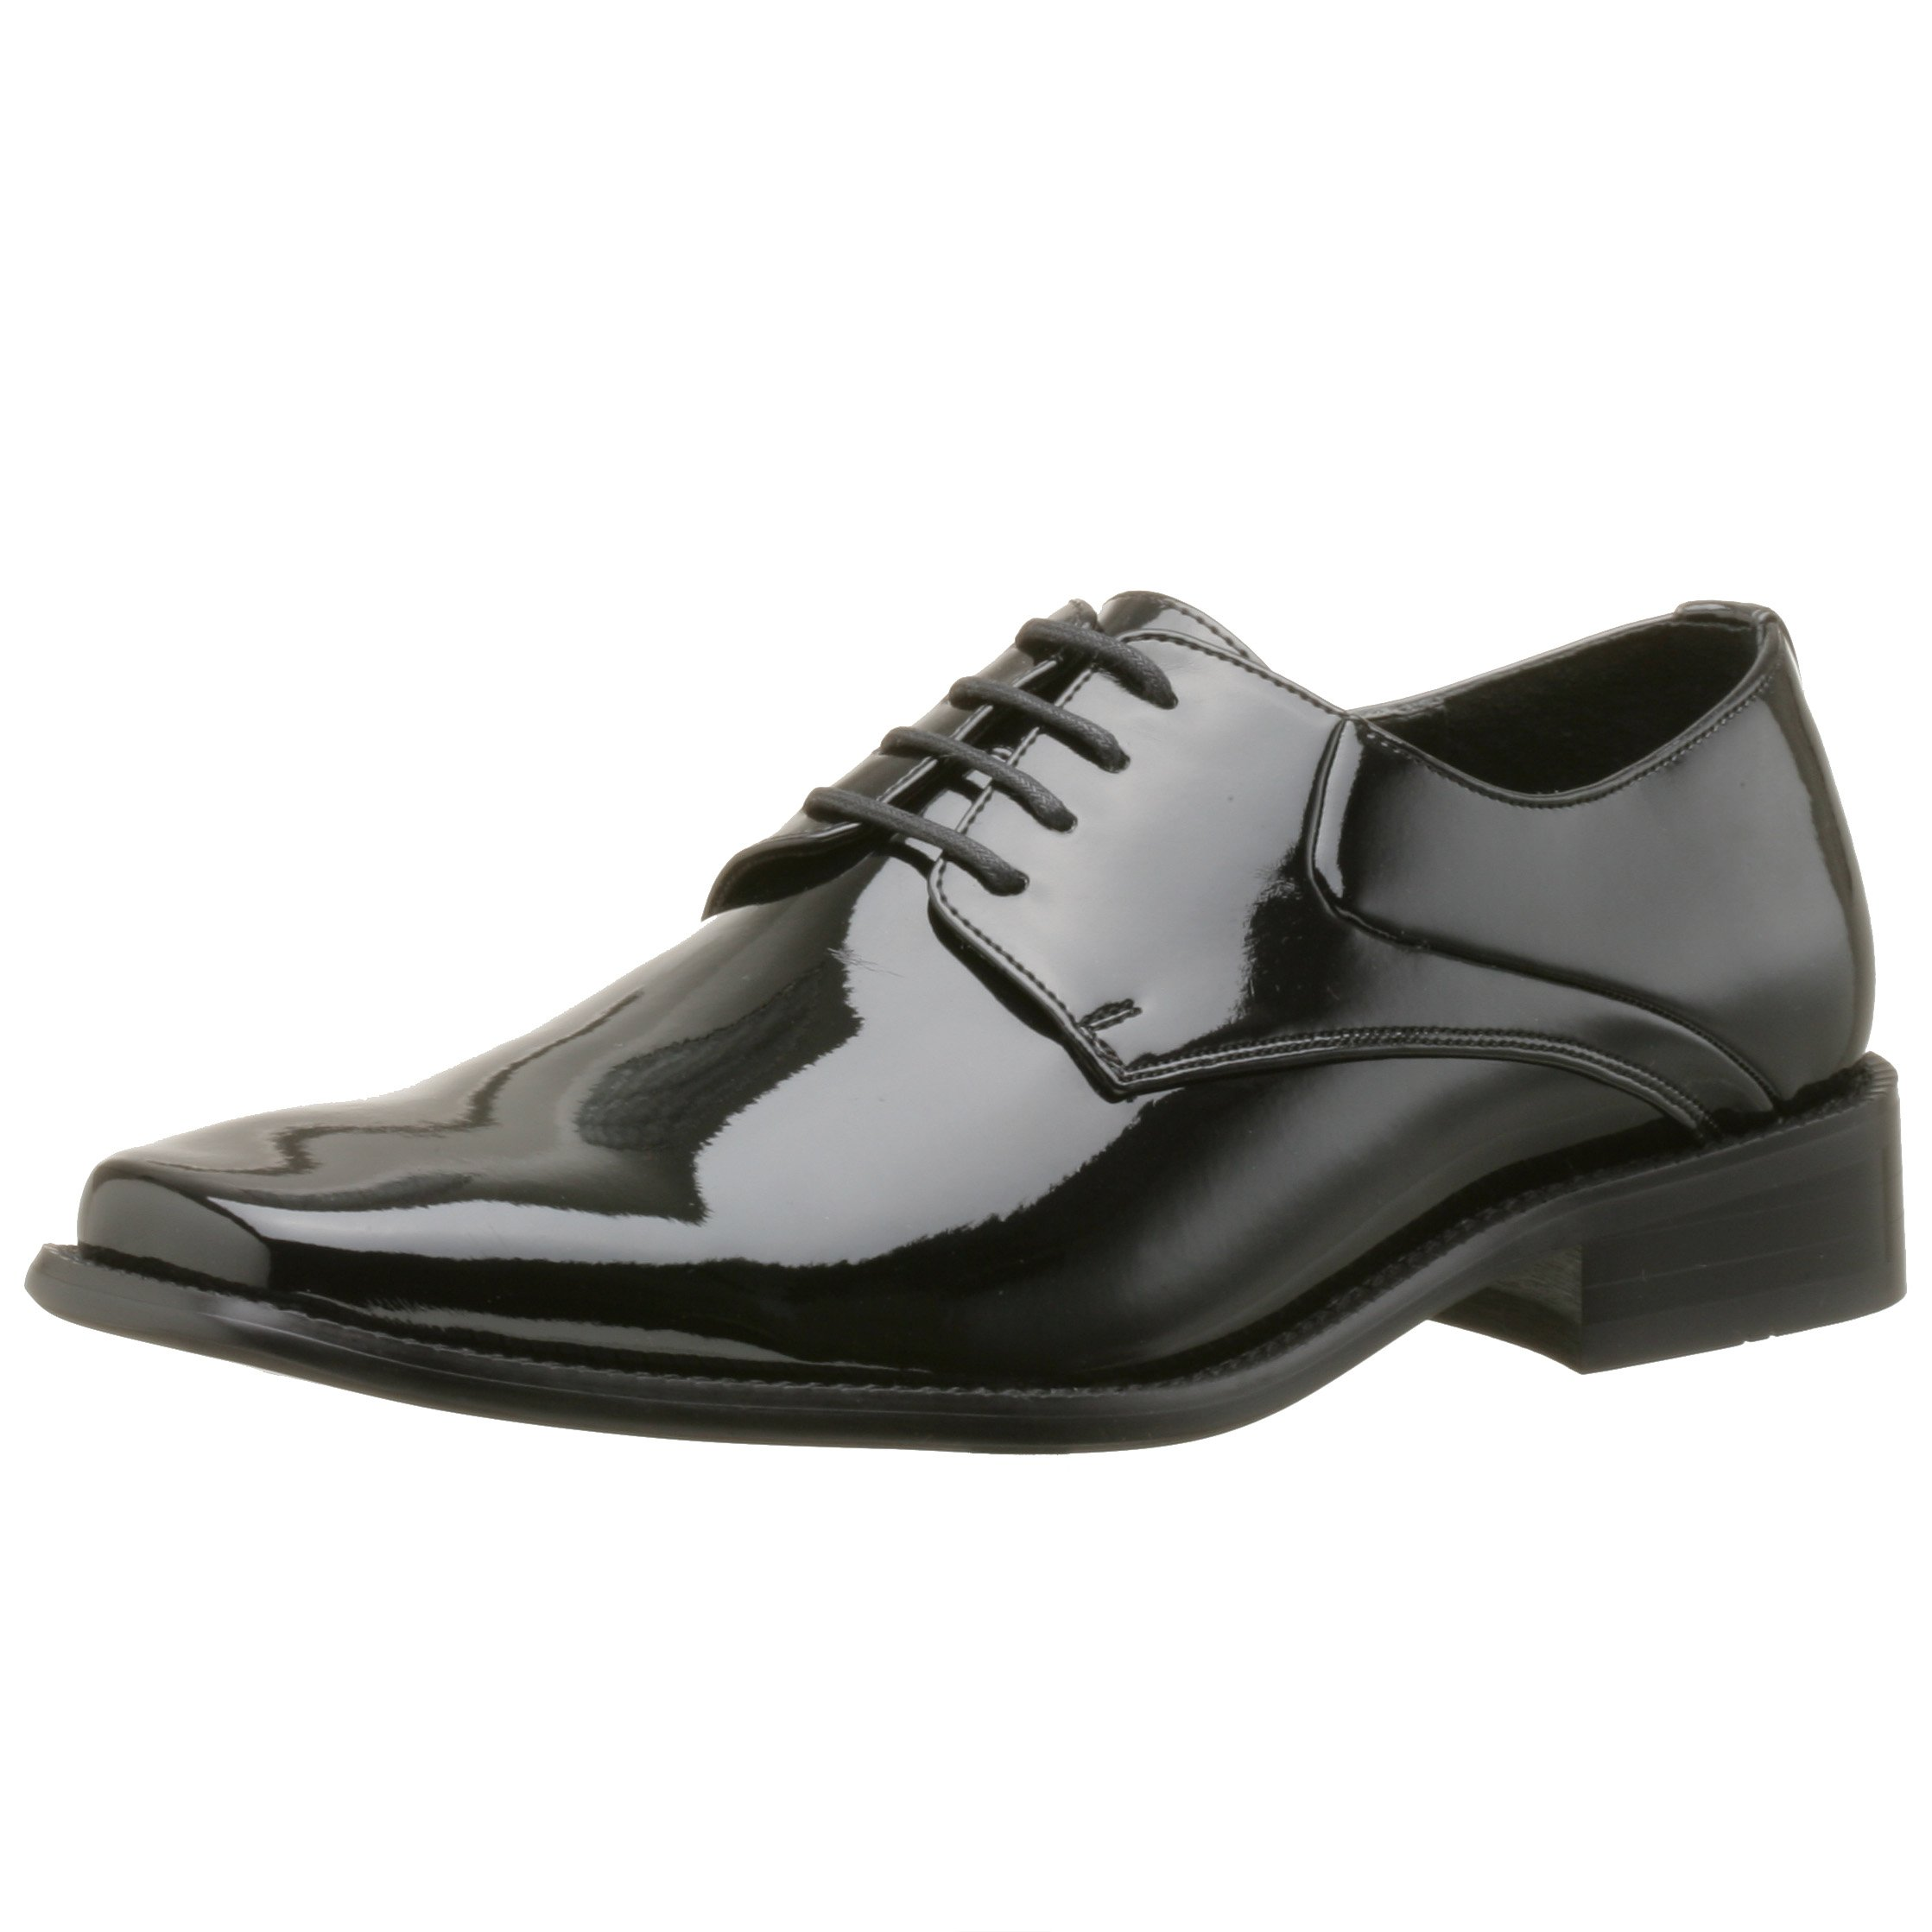 Zengara Mens Z30028 Oxford Tuxedo Shoes